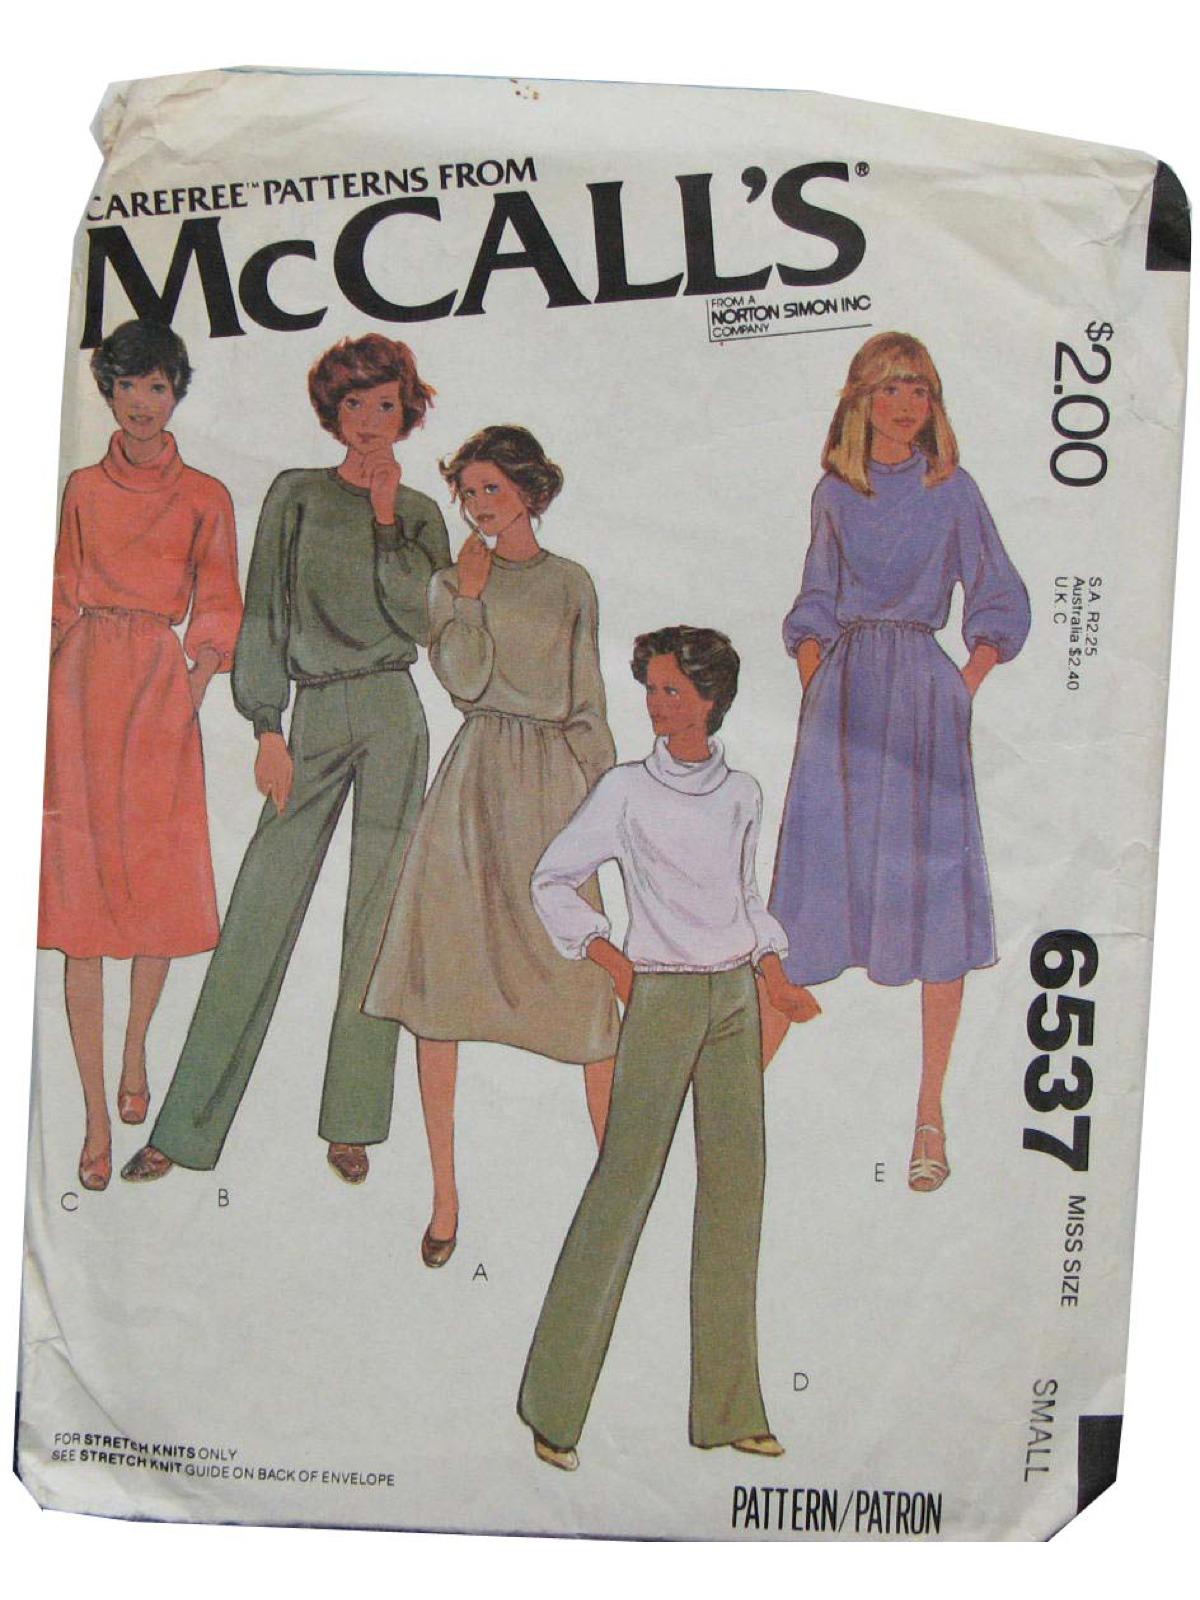 1970s Vintage Sewing Pattern 1979 Mccalls Pattern No